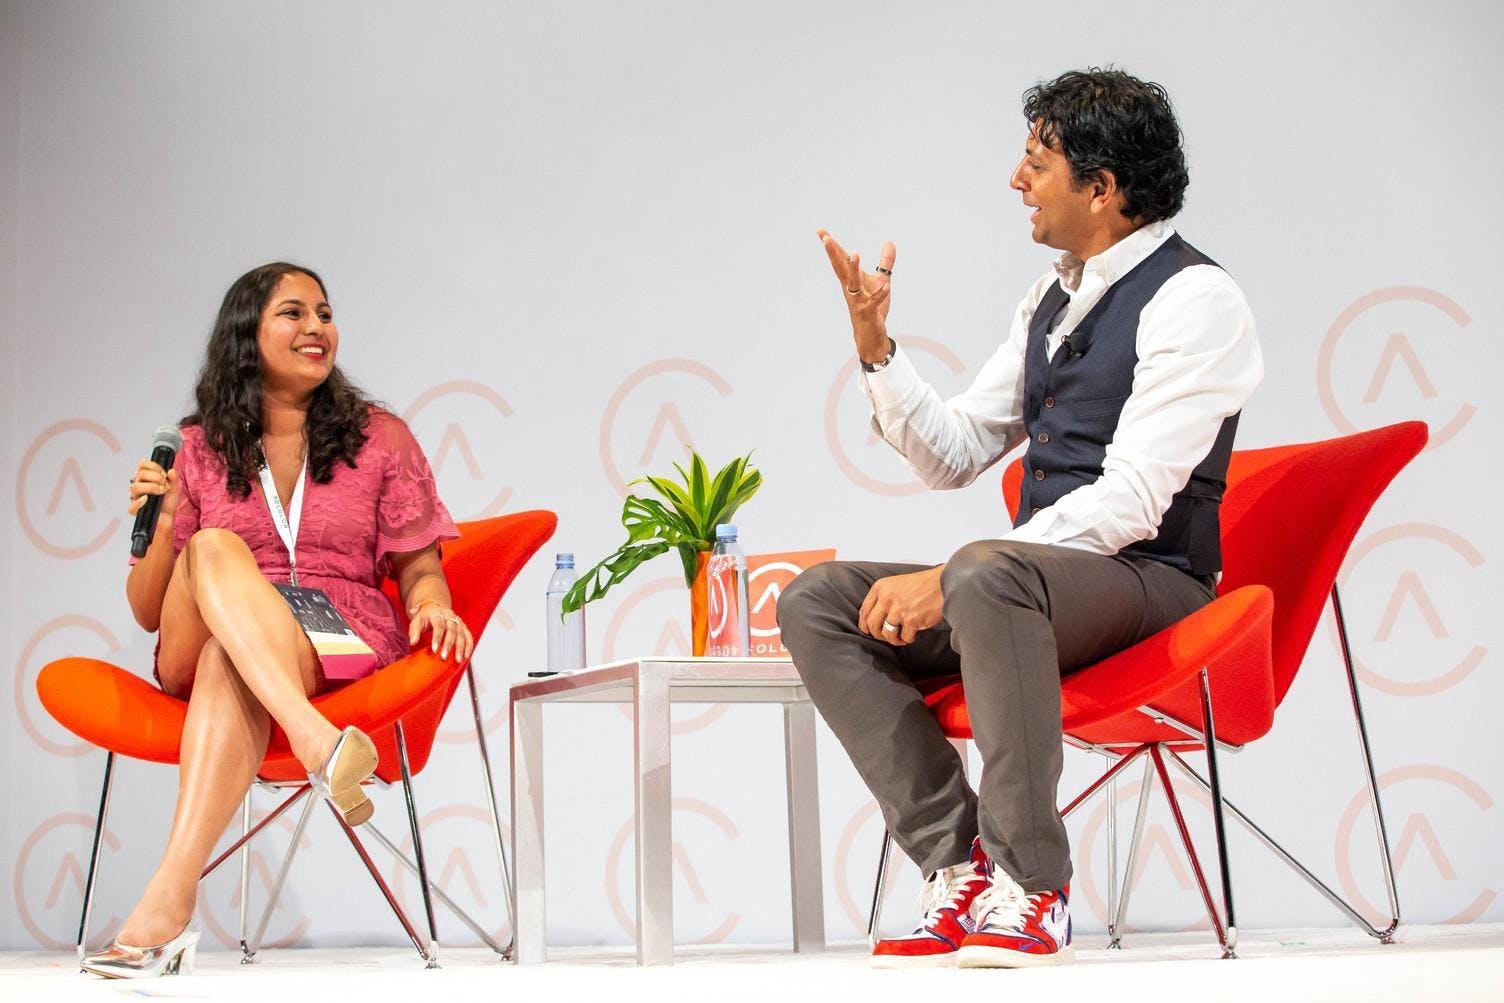 Nayantara Dutta, seema.com, seema network, seema 2020, IWD 2020, International woman's day, seema newsletter, south asian women leaders